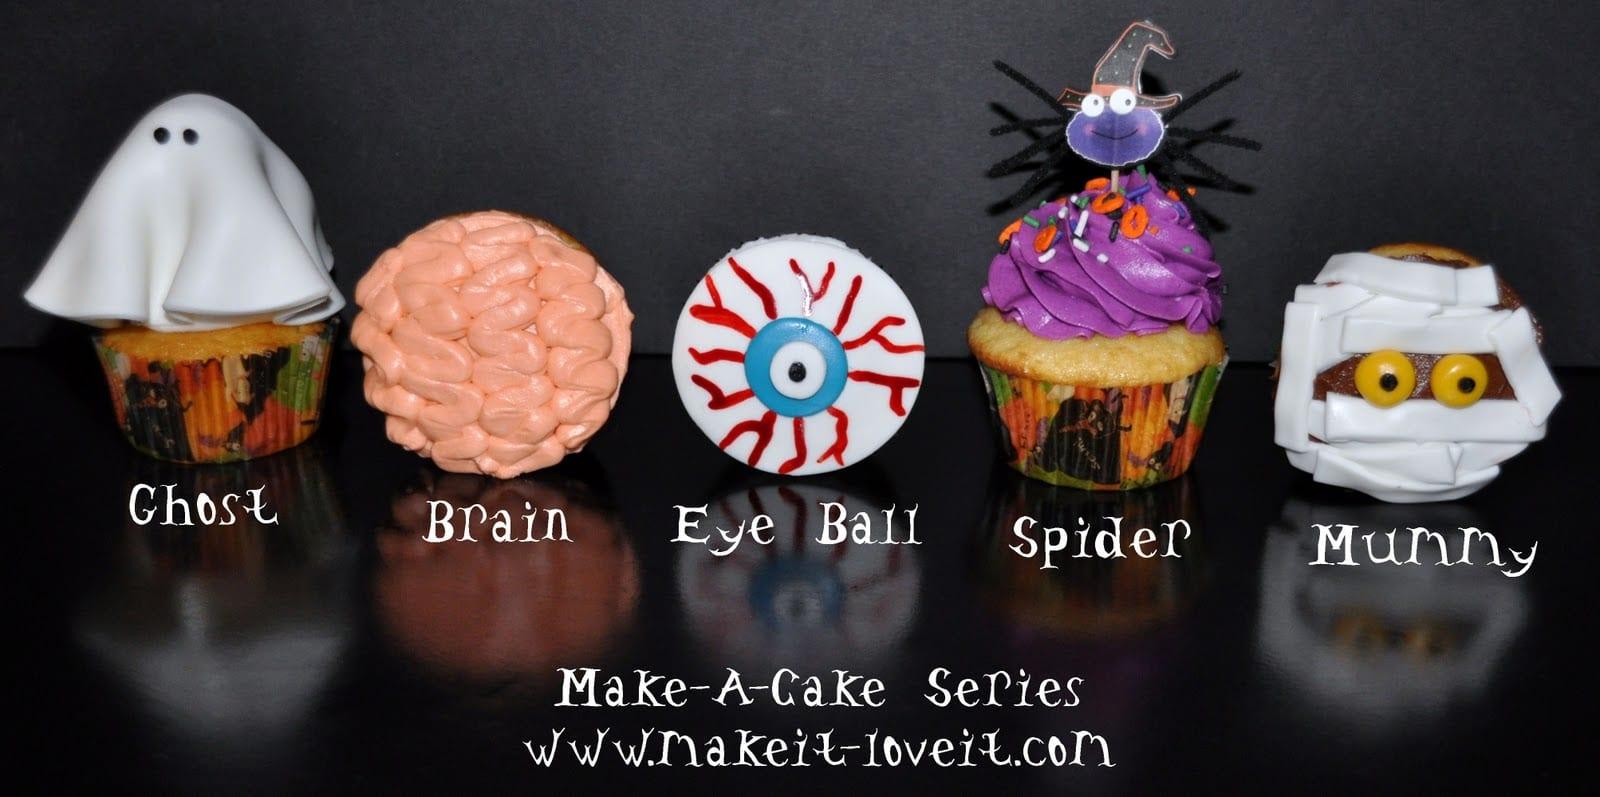 Make-a-Cake Series: Halloween Cupcakes